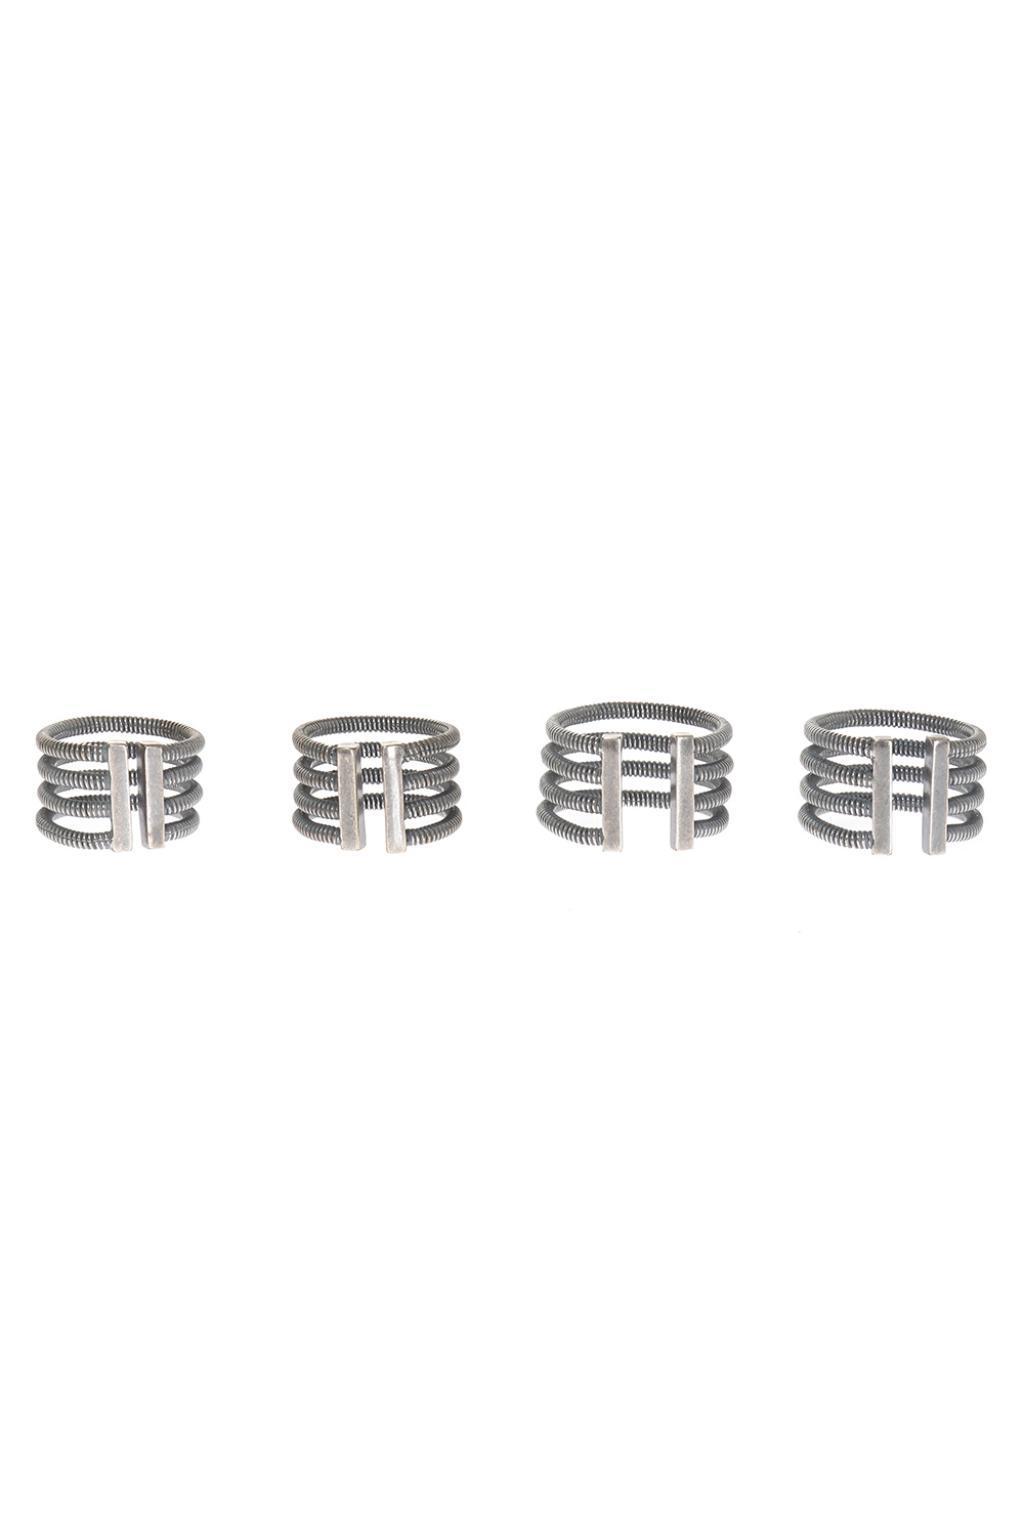 Maison Margiela Set Of 4 Rings in Silver (Metallic) for Men